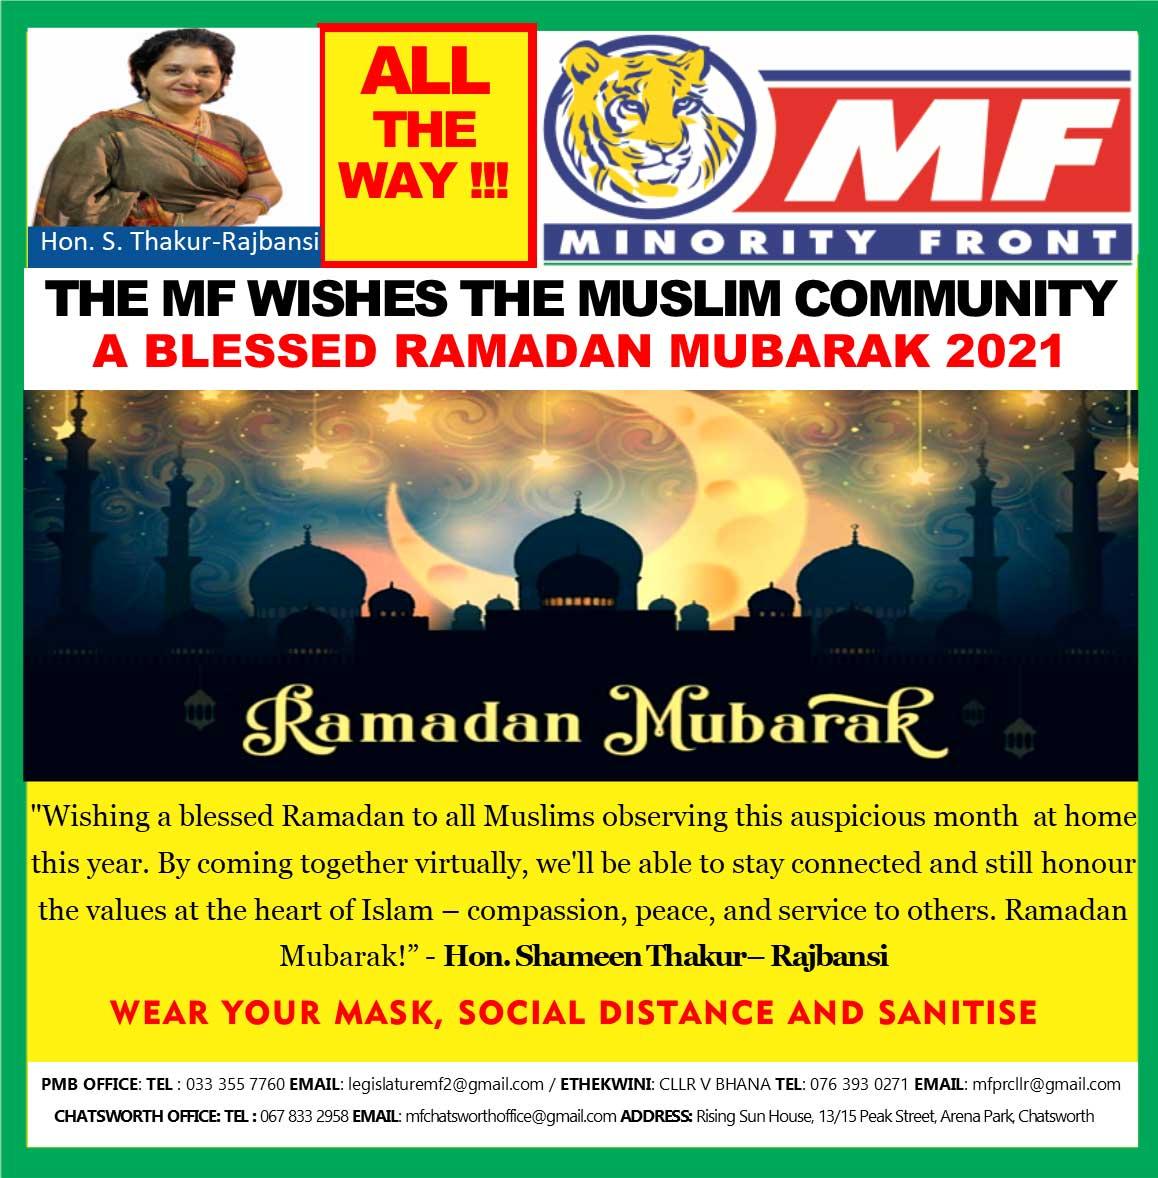 The MF Wishes The Muslim Community a Blessed Ramadan Mubarak